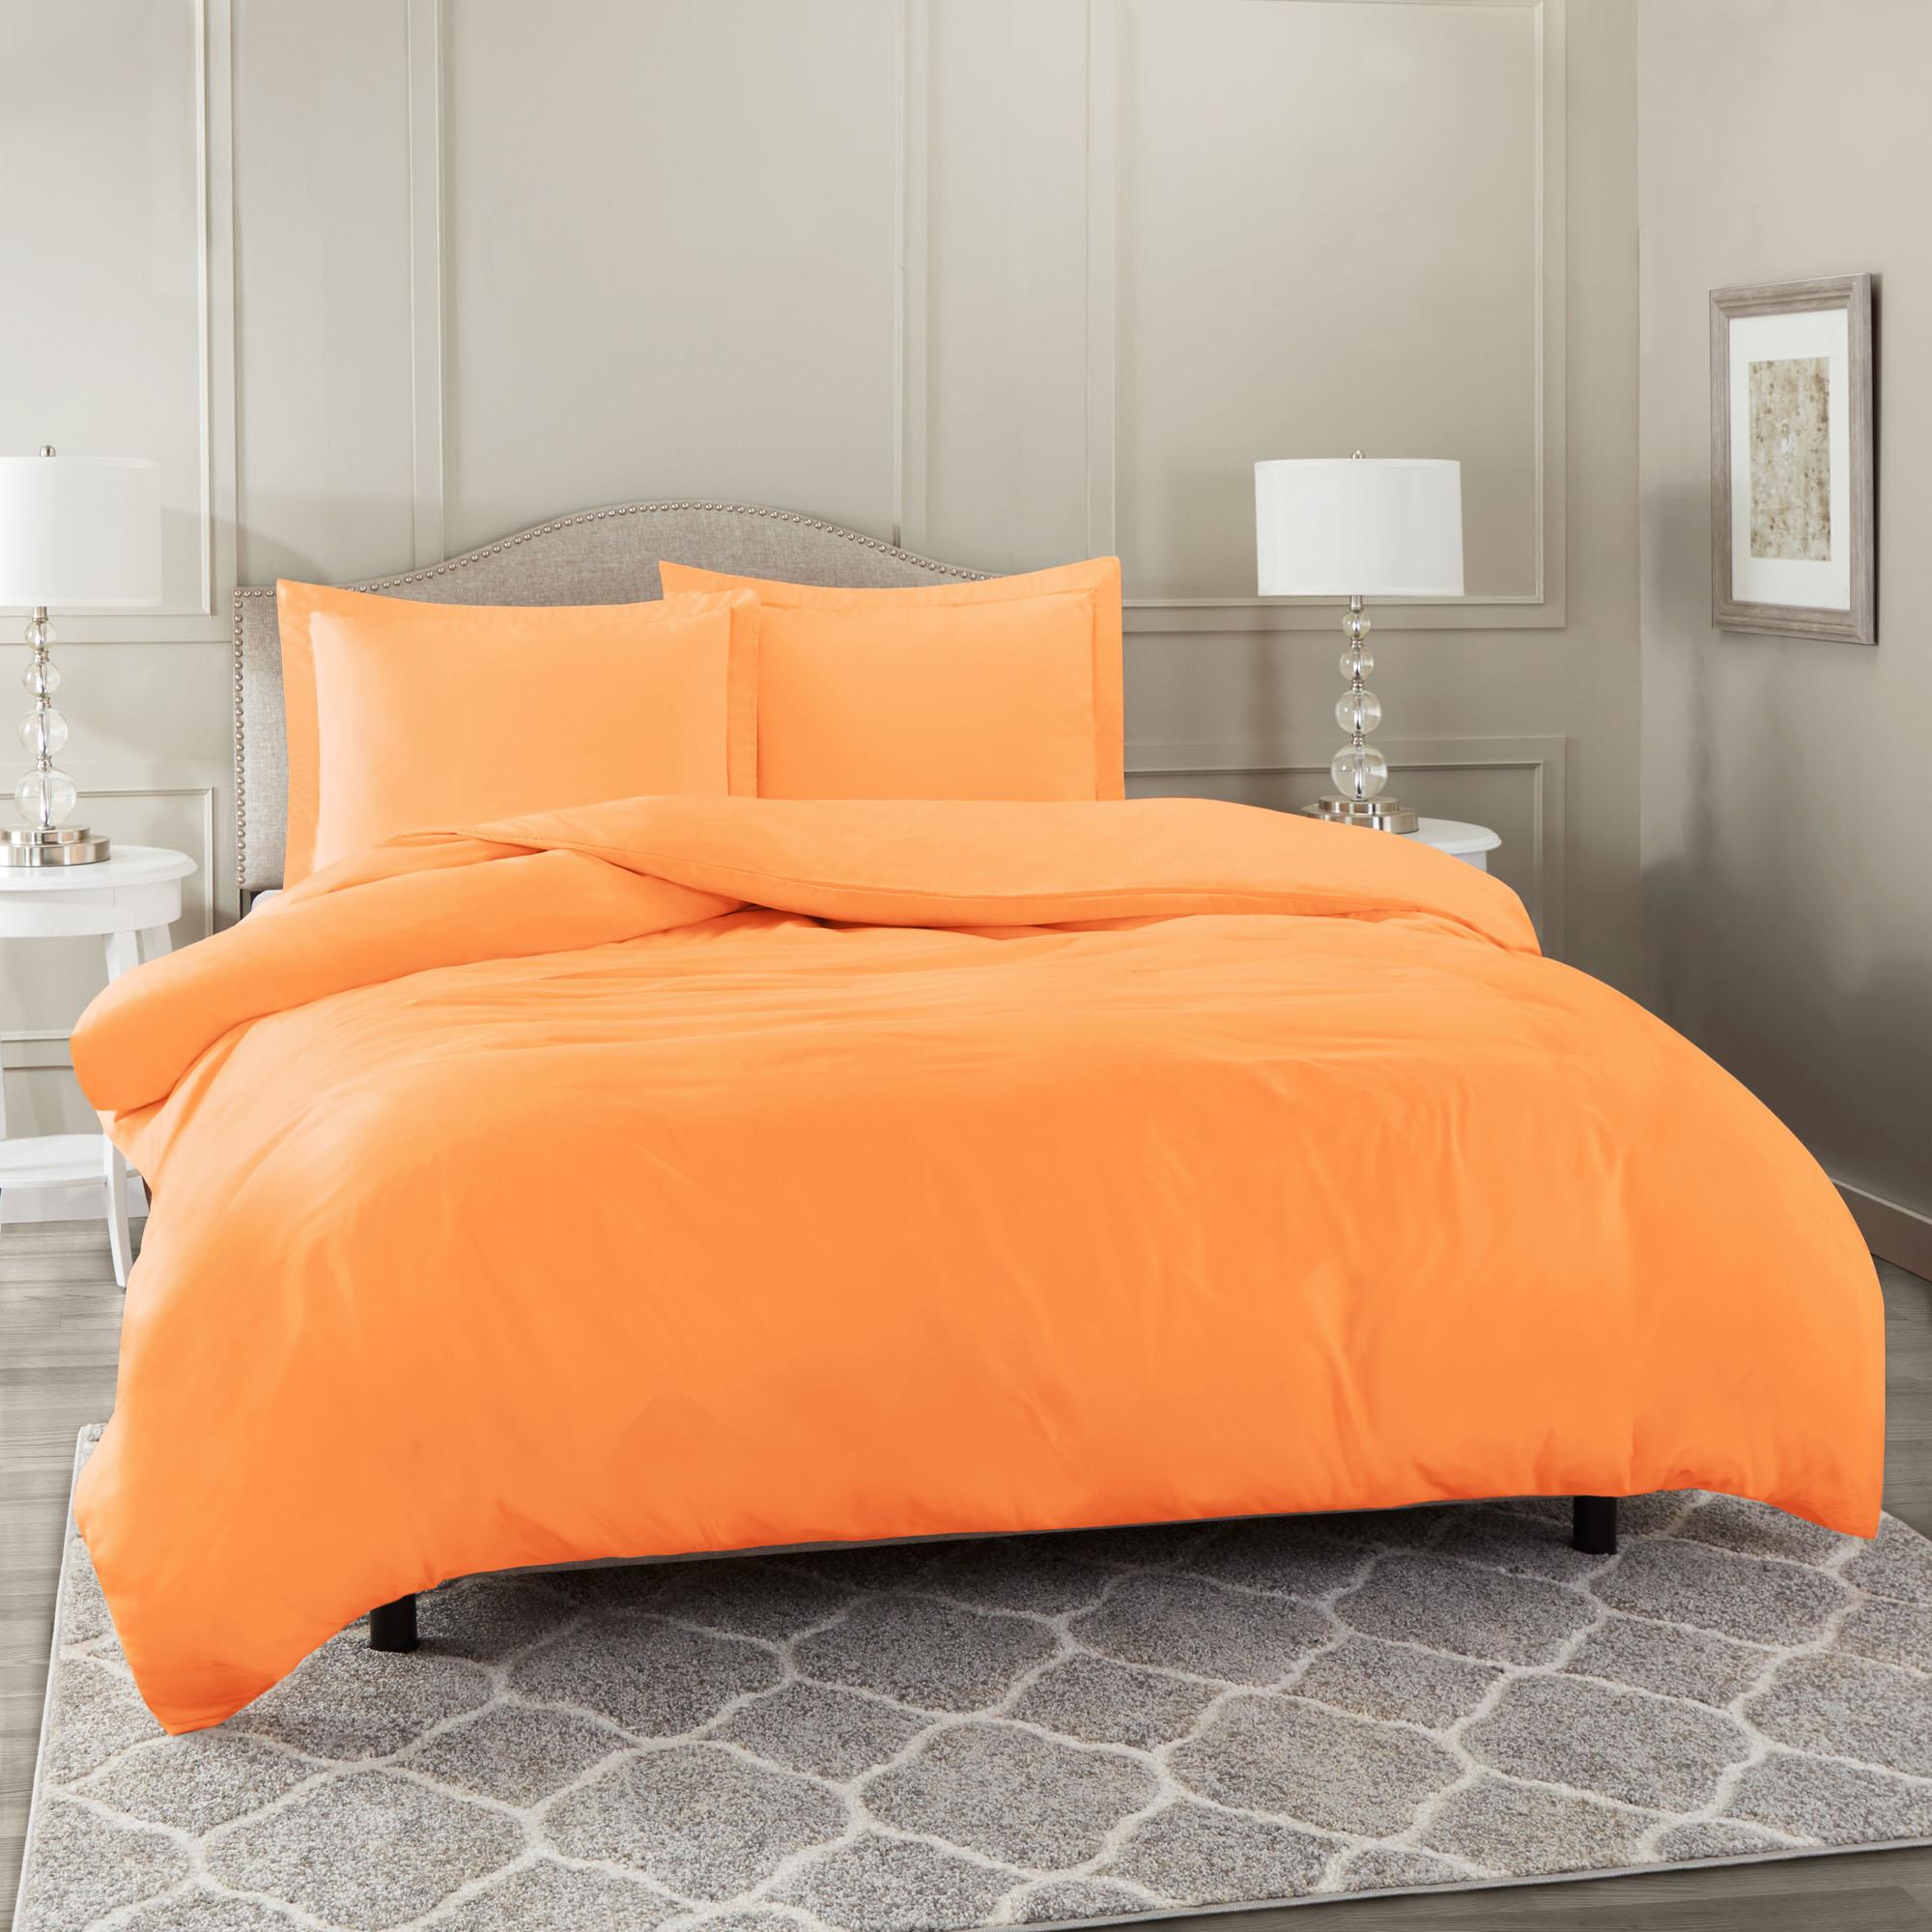 Duvet Cover Set Soft Brushed Comforter W Pillow Sham Light Orange Twin